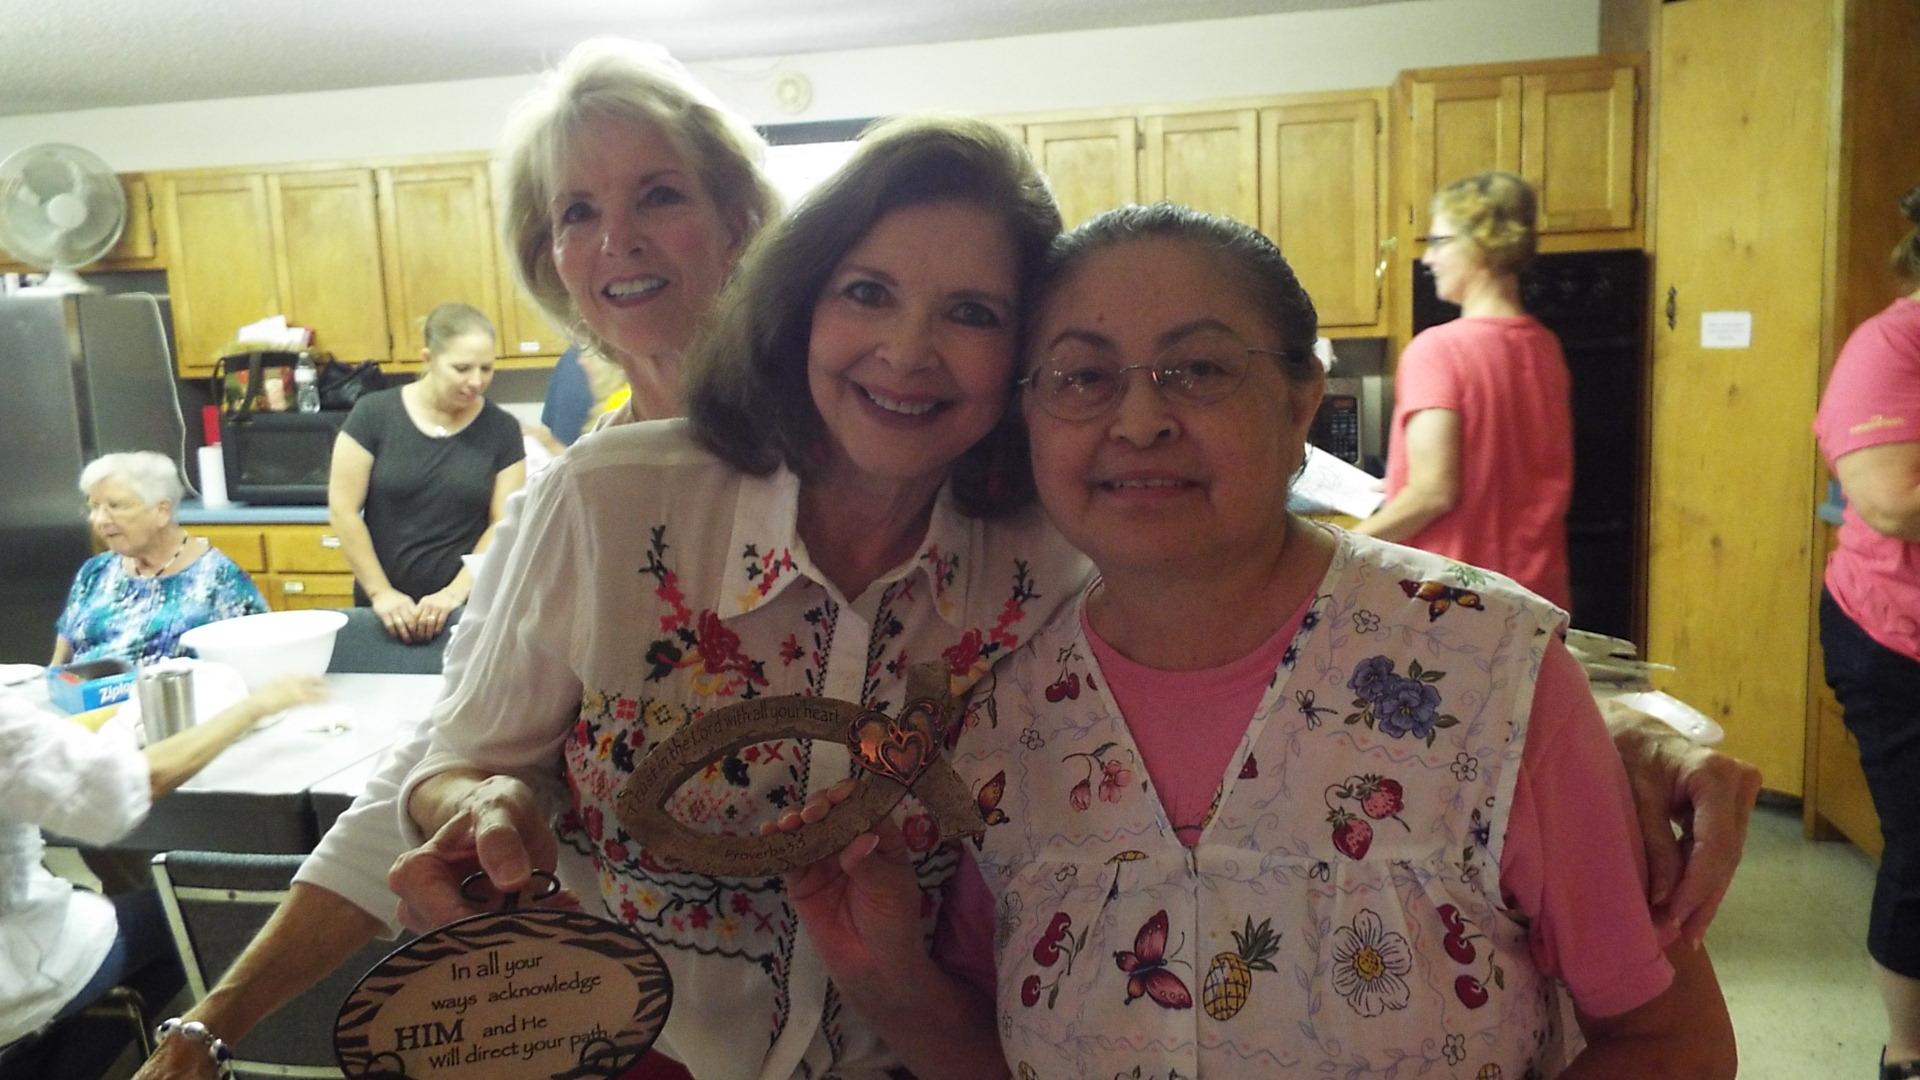 Mary Carol, Tita, and Minnie